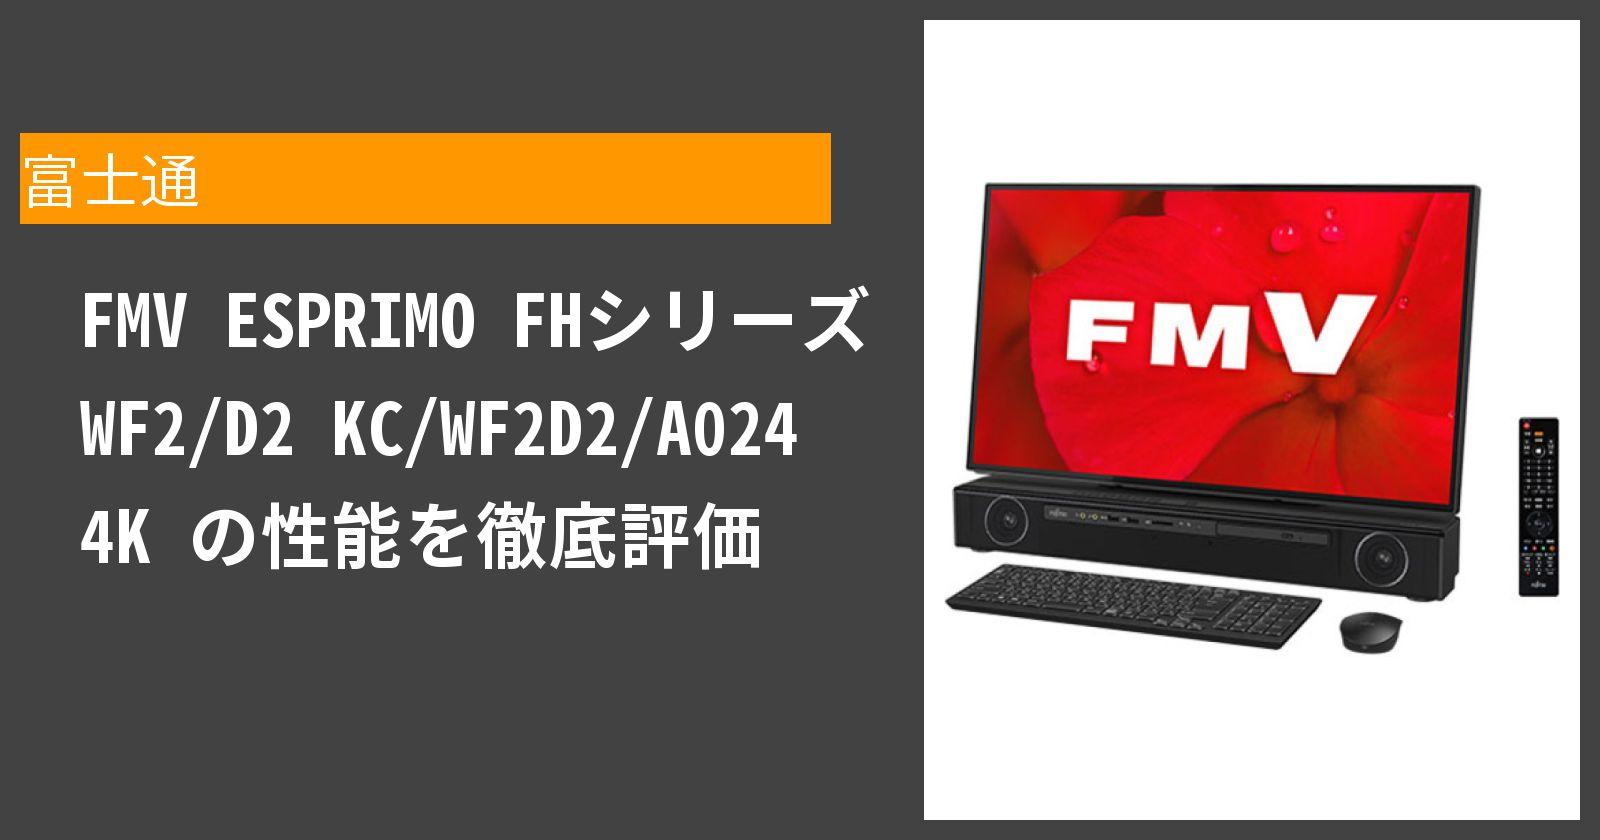 FMV ESPRIMO FHシリーズ WF2/D2 KC/WF2D2/A024 4K の性能を徹底評価